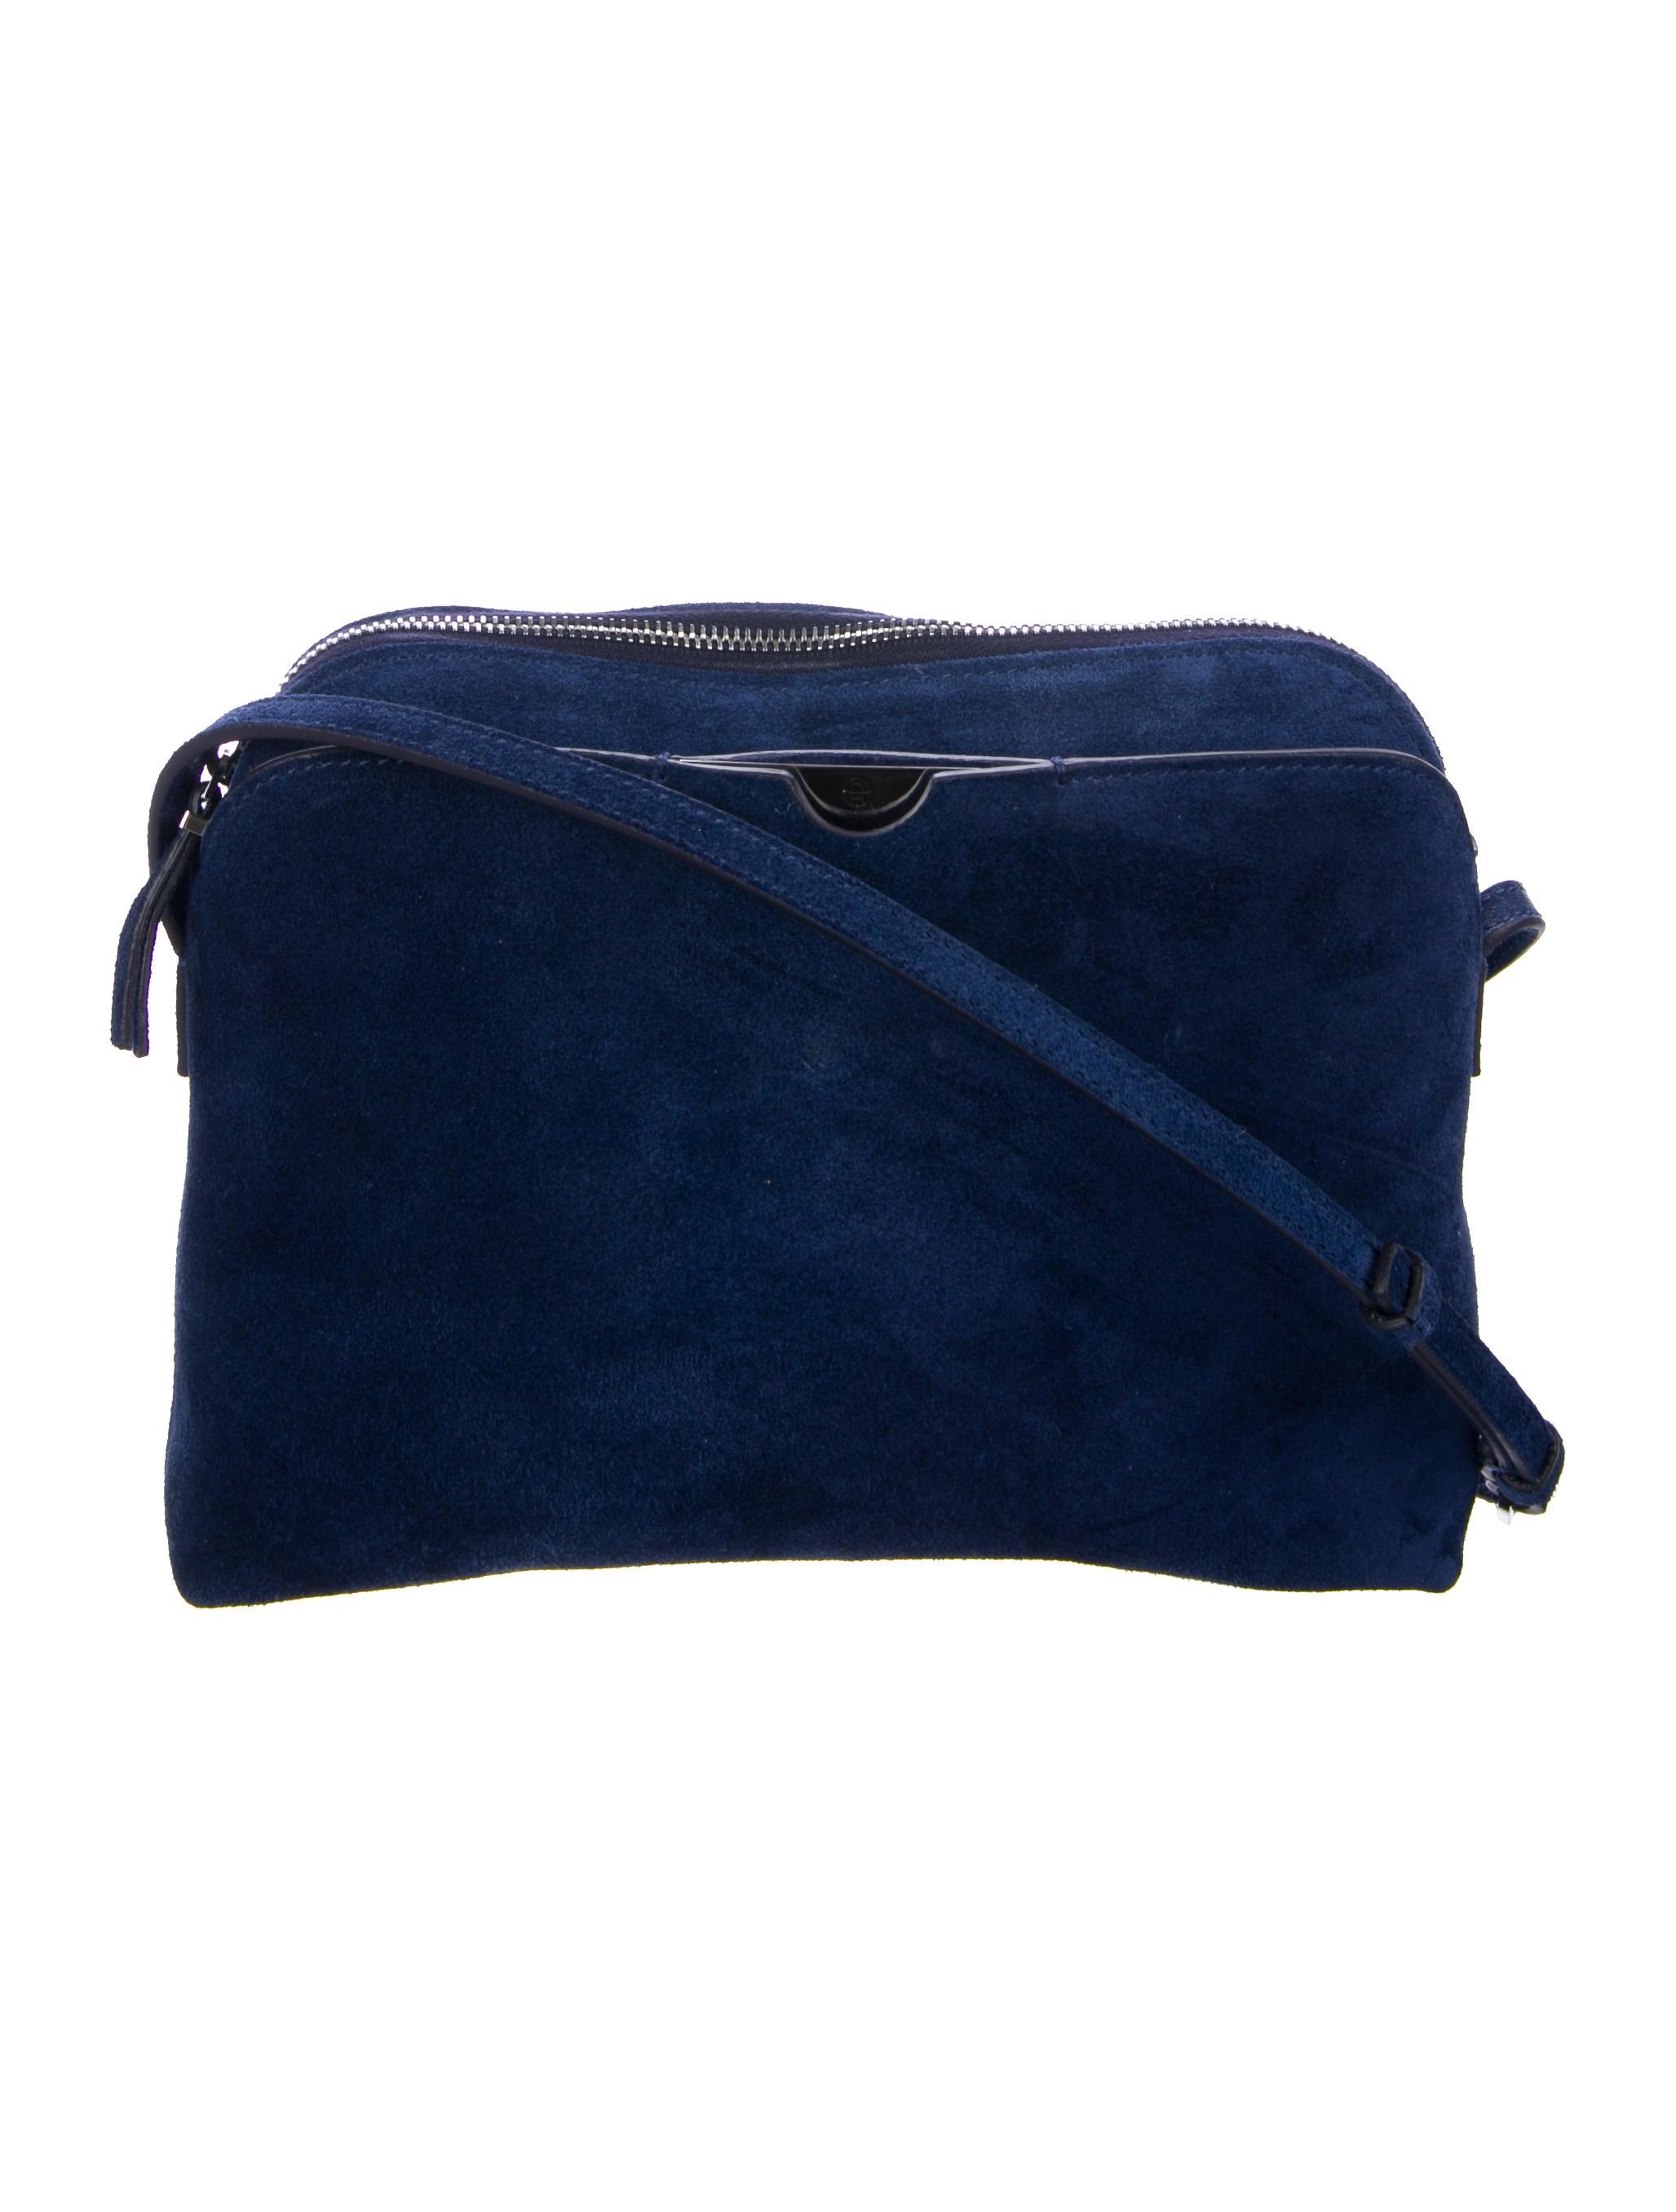 d24b0cad0 The Row Suede Multi-Pouch Crossbody Bag - Handbags - THR40137   The ...